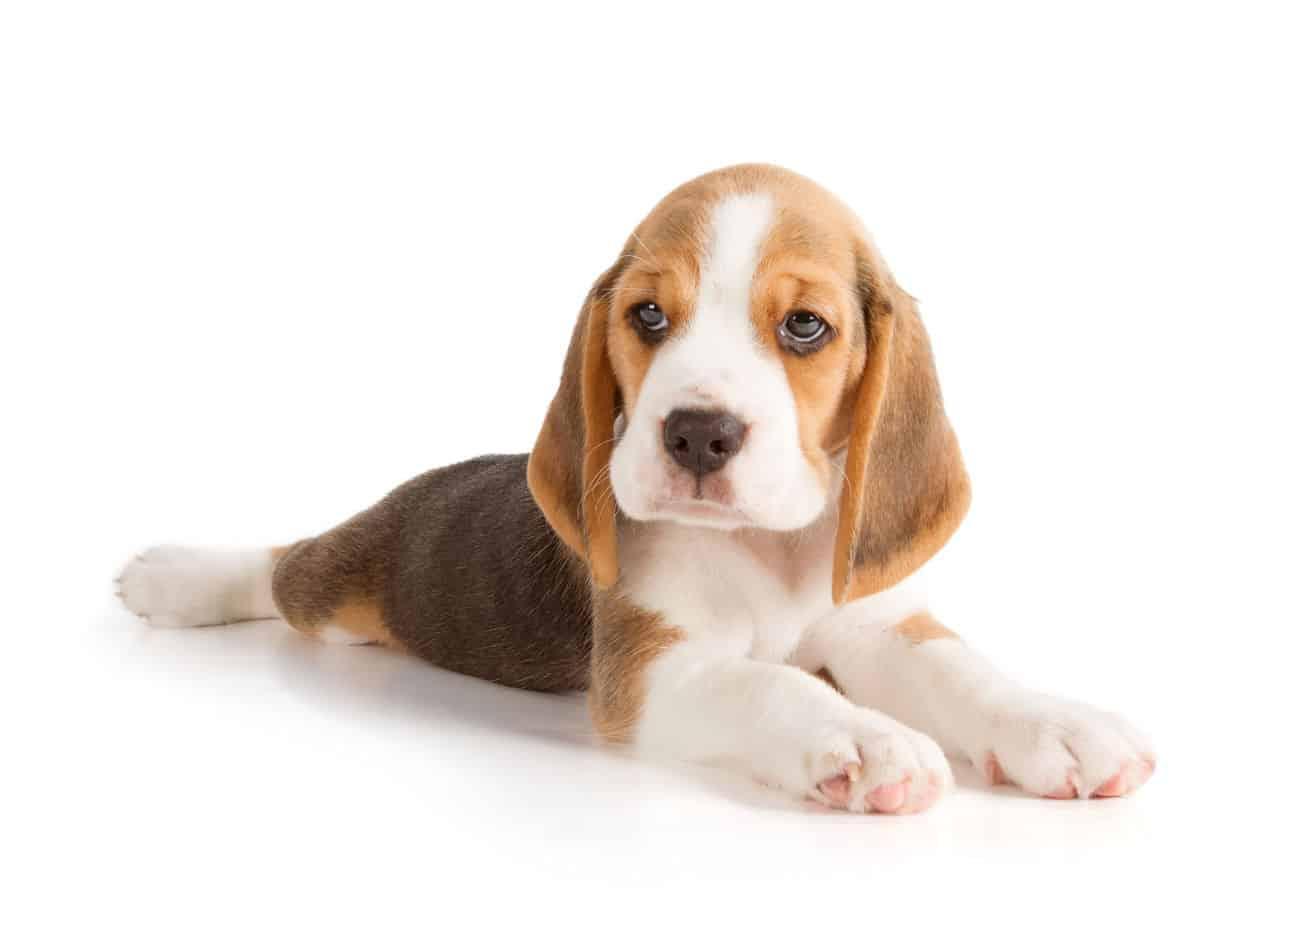 Why Do Beagles Cry?